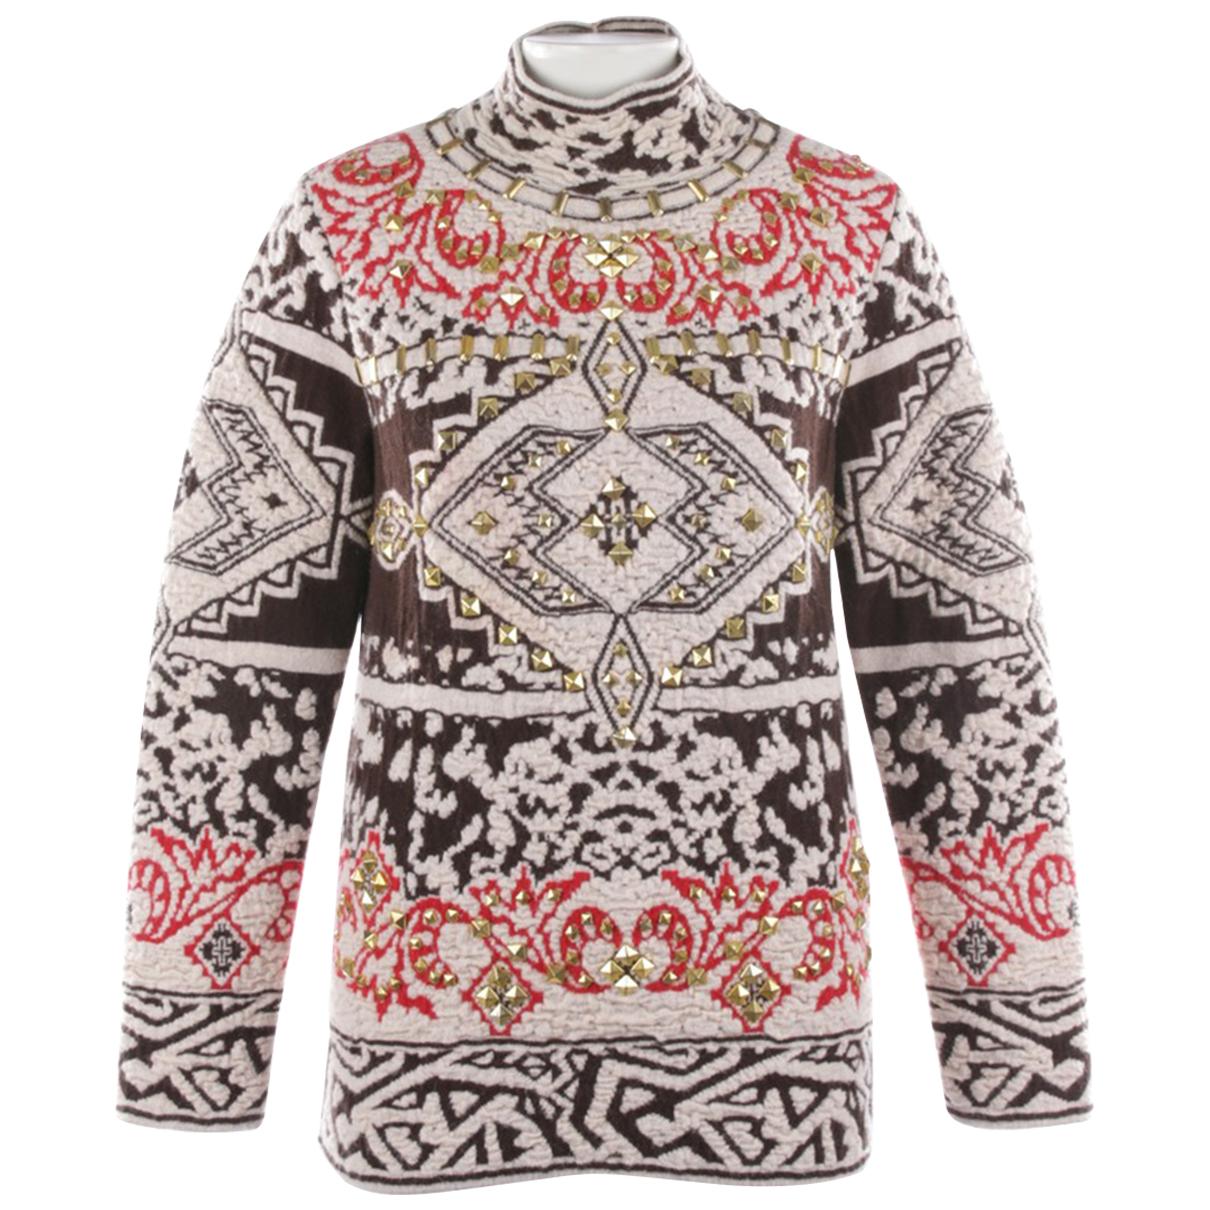 Emilio Pucci \N Beige Wool Knitwear for Women S International